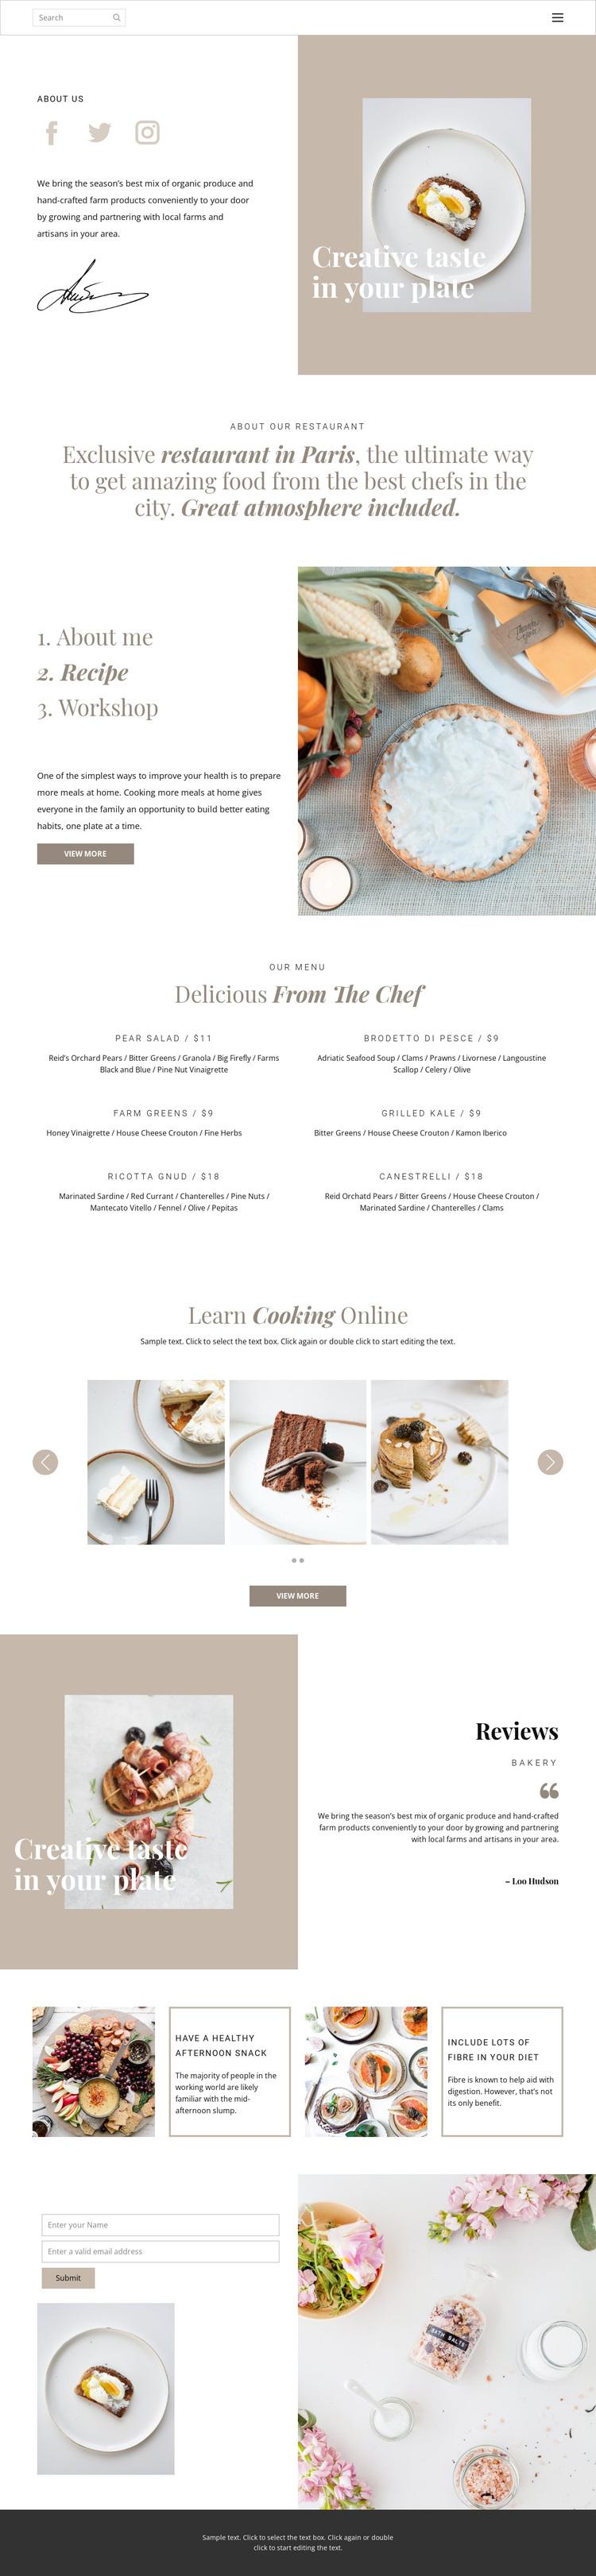 Creative taste in plate Joomla Page Builder